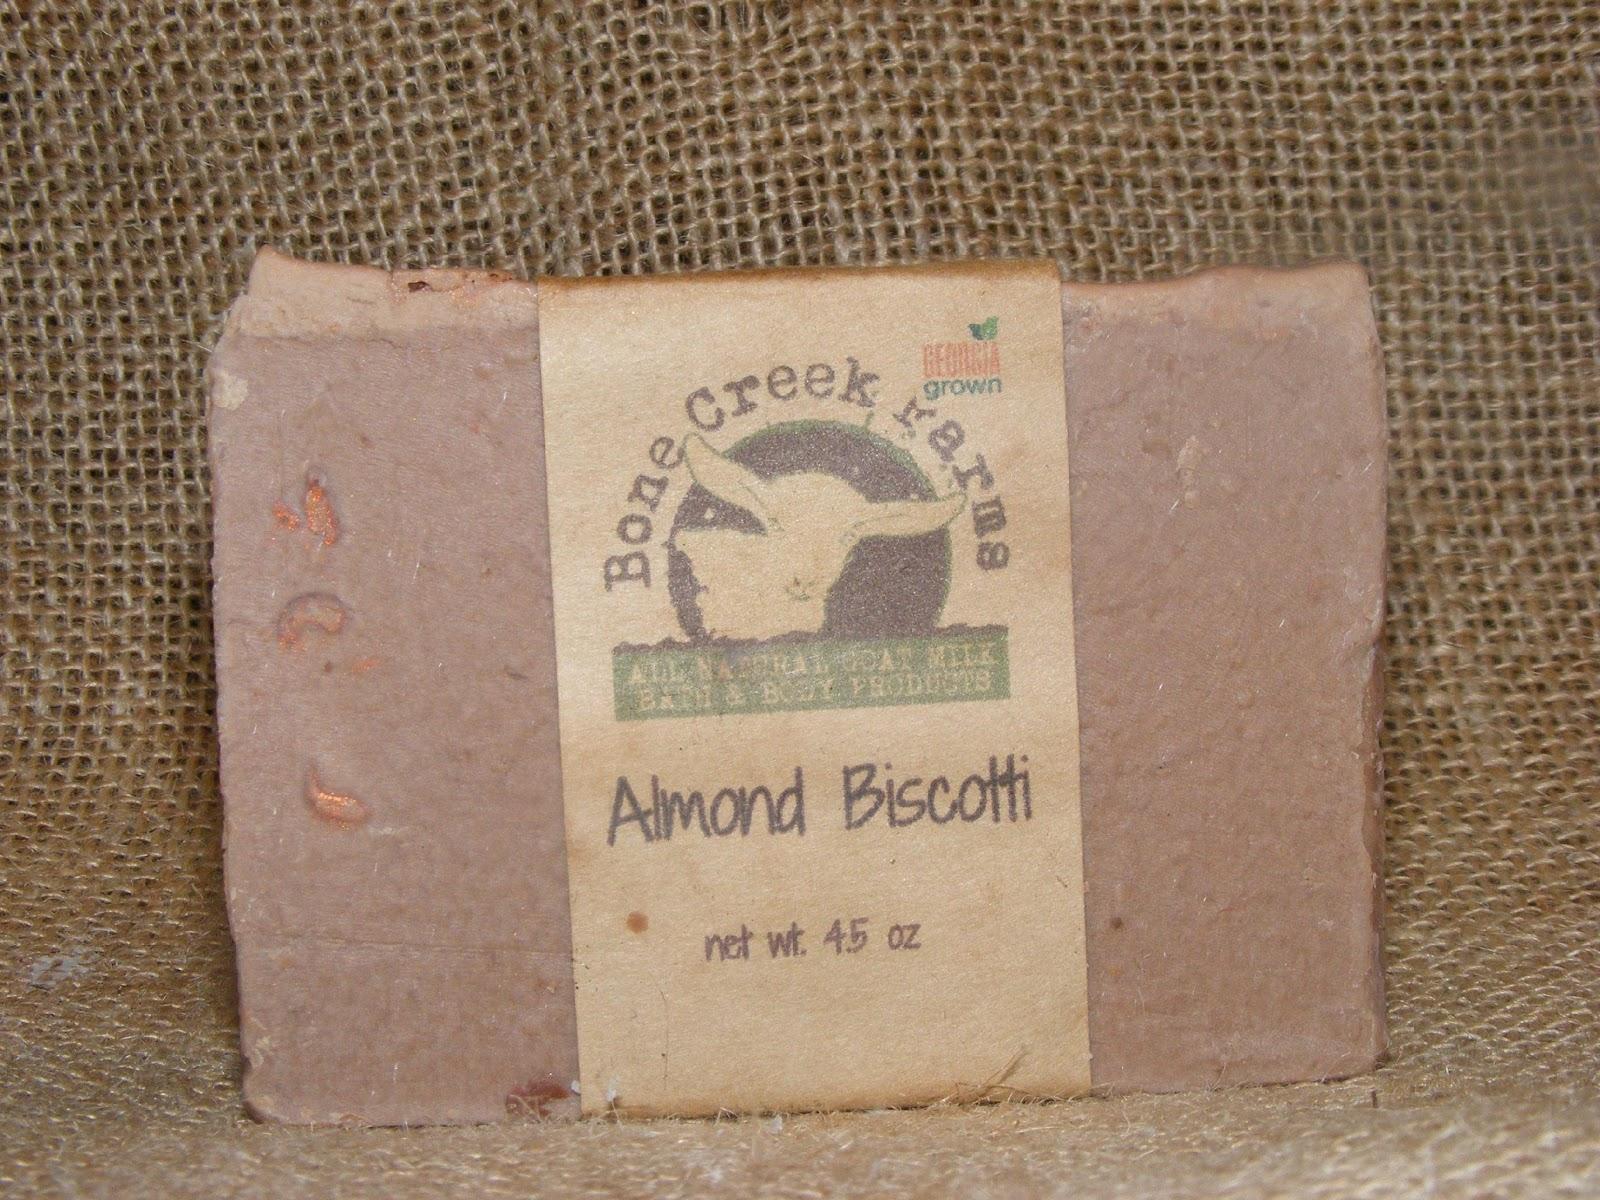 almondbiscotti.jpg